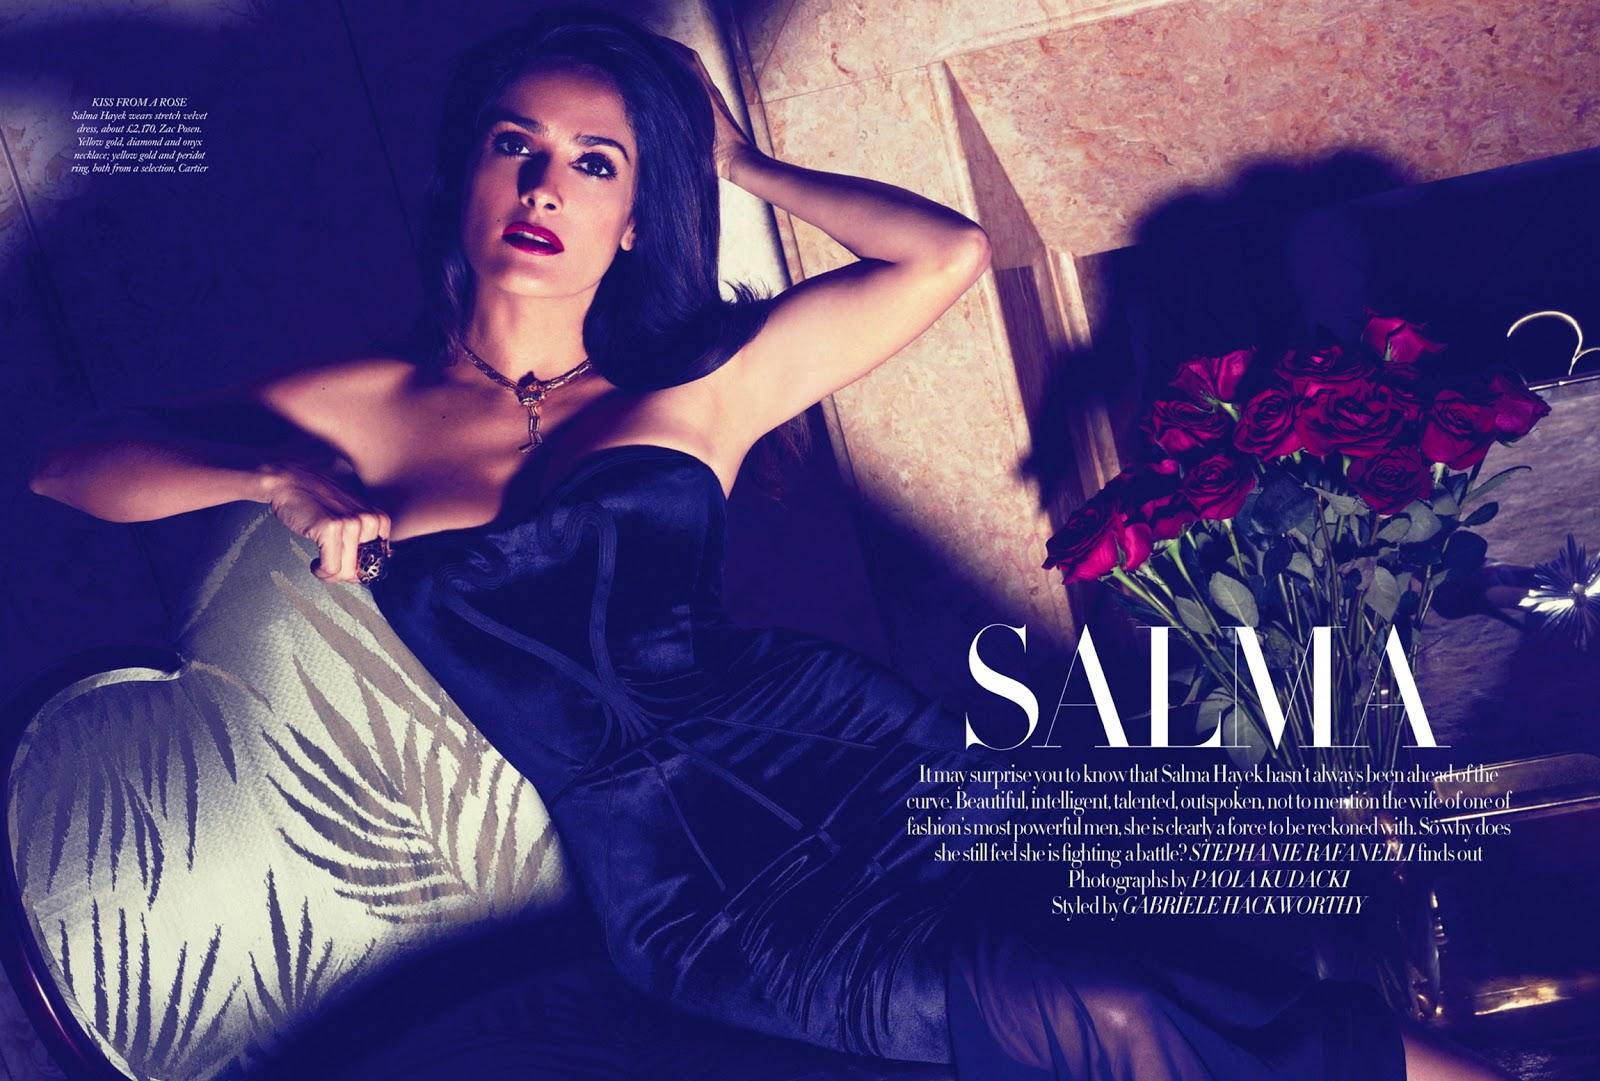 Salma Hayek Harpers Bazaar, November 2012 nudes (57 pics)